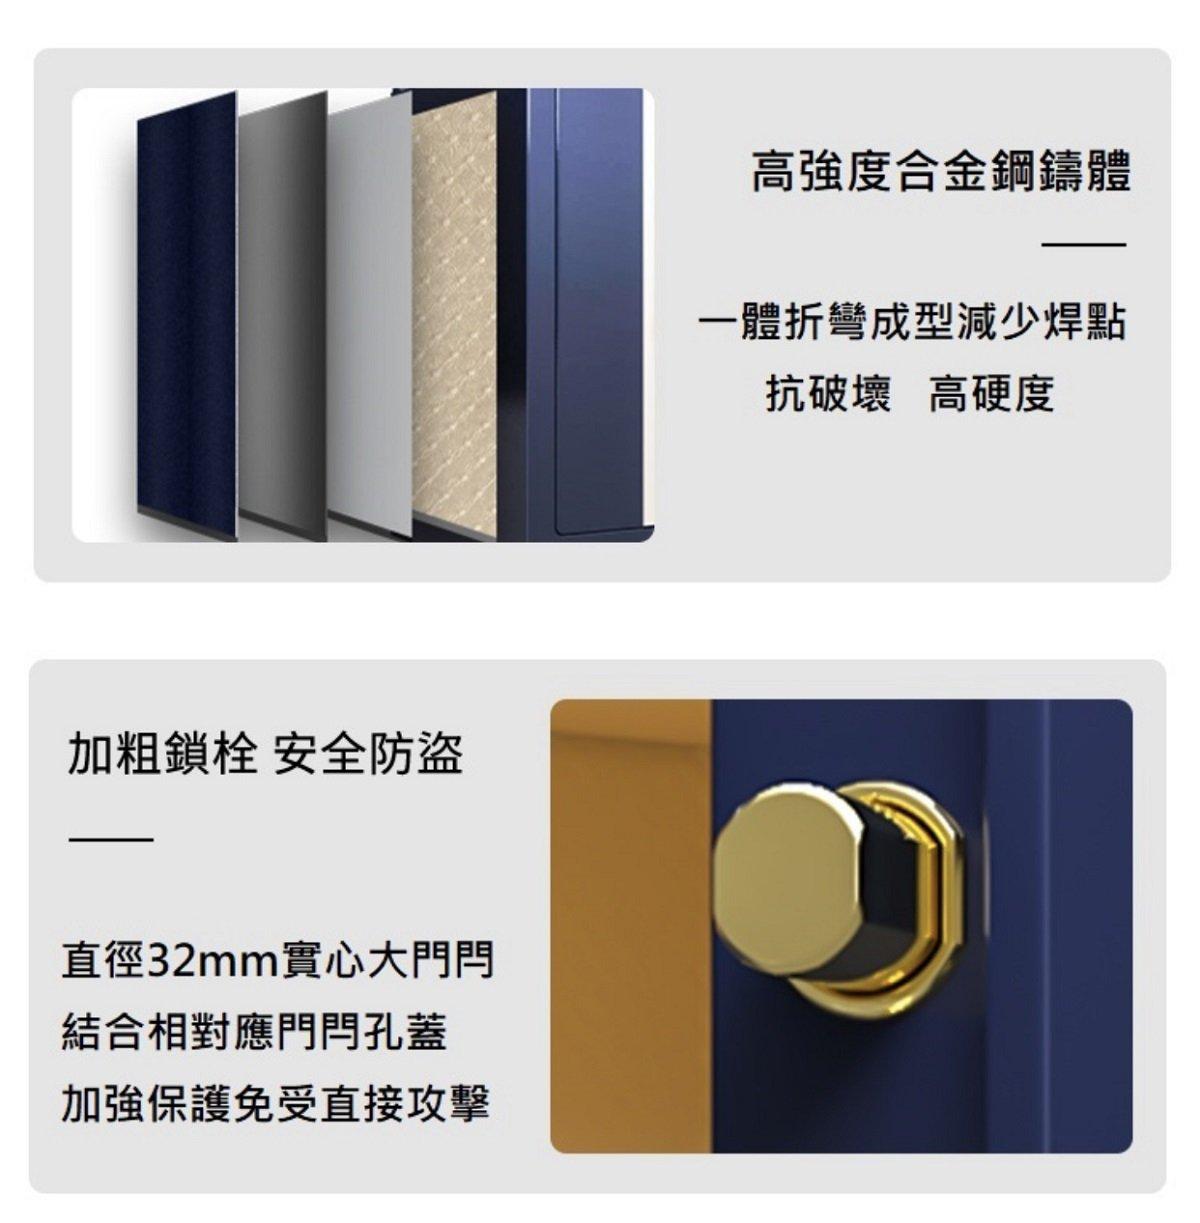 Marketing graphic-PB80-10